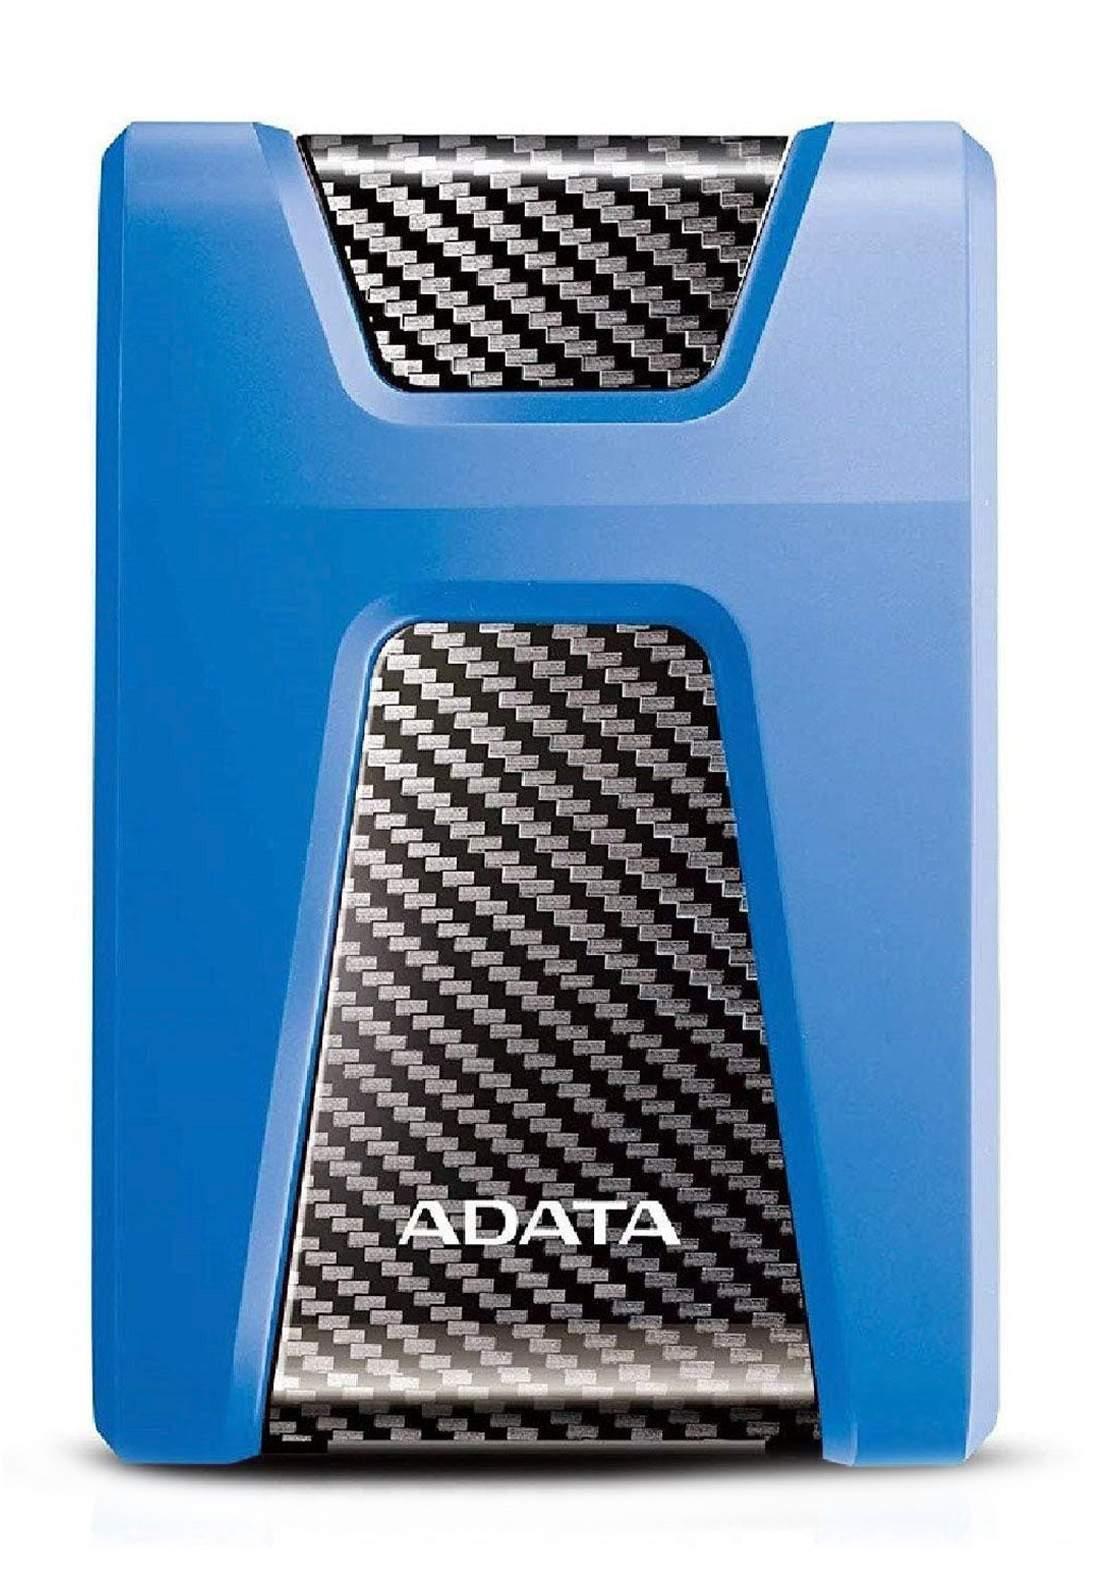 ADATA HD 650 External Hard Drive 2TB - Blue  هارد خارجي